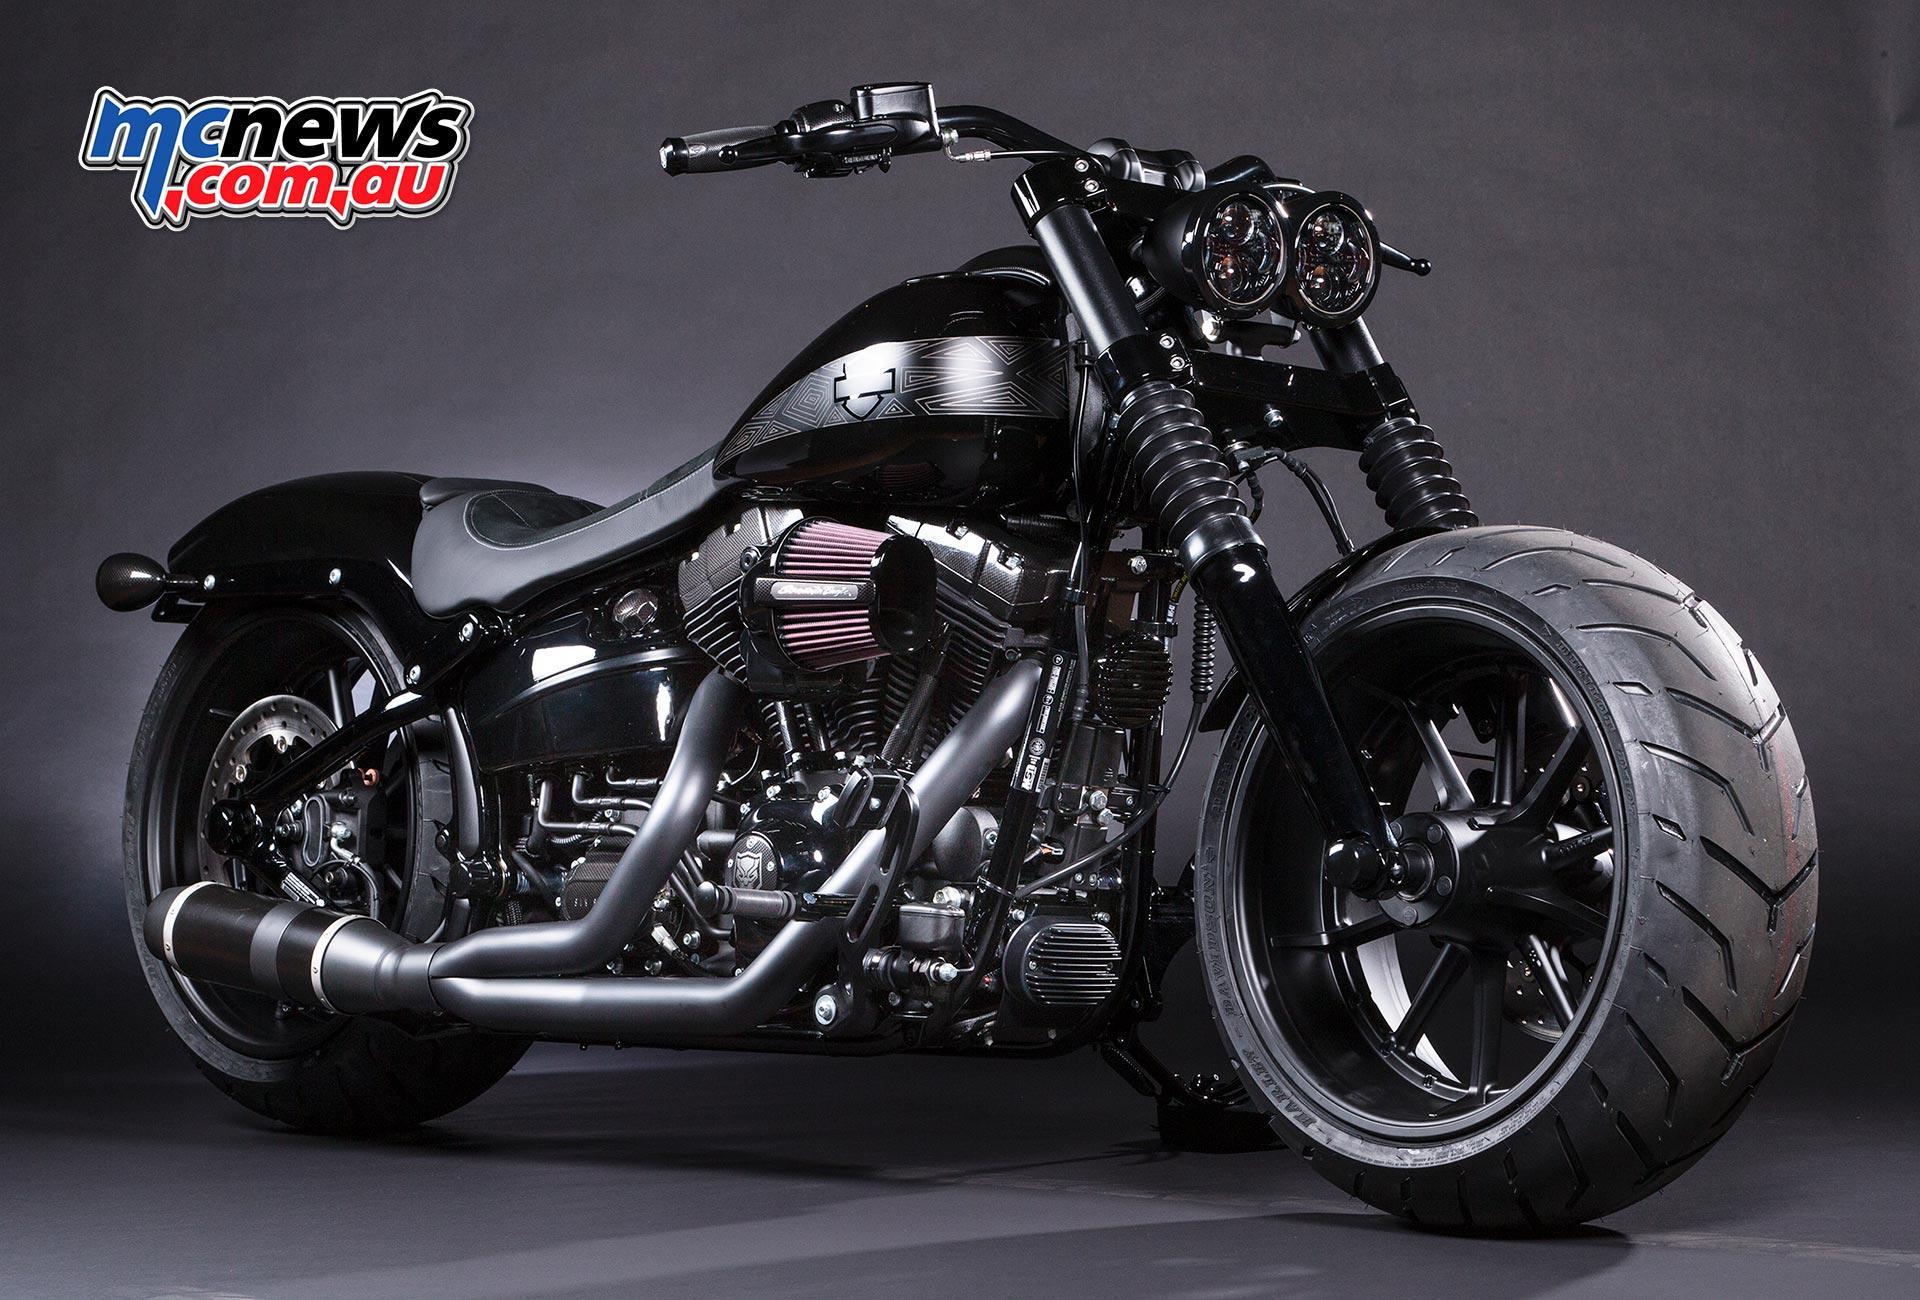 Harley Davidson Wallpapers Top Free Harley Davidson Backgrounds